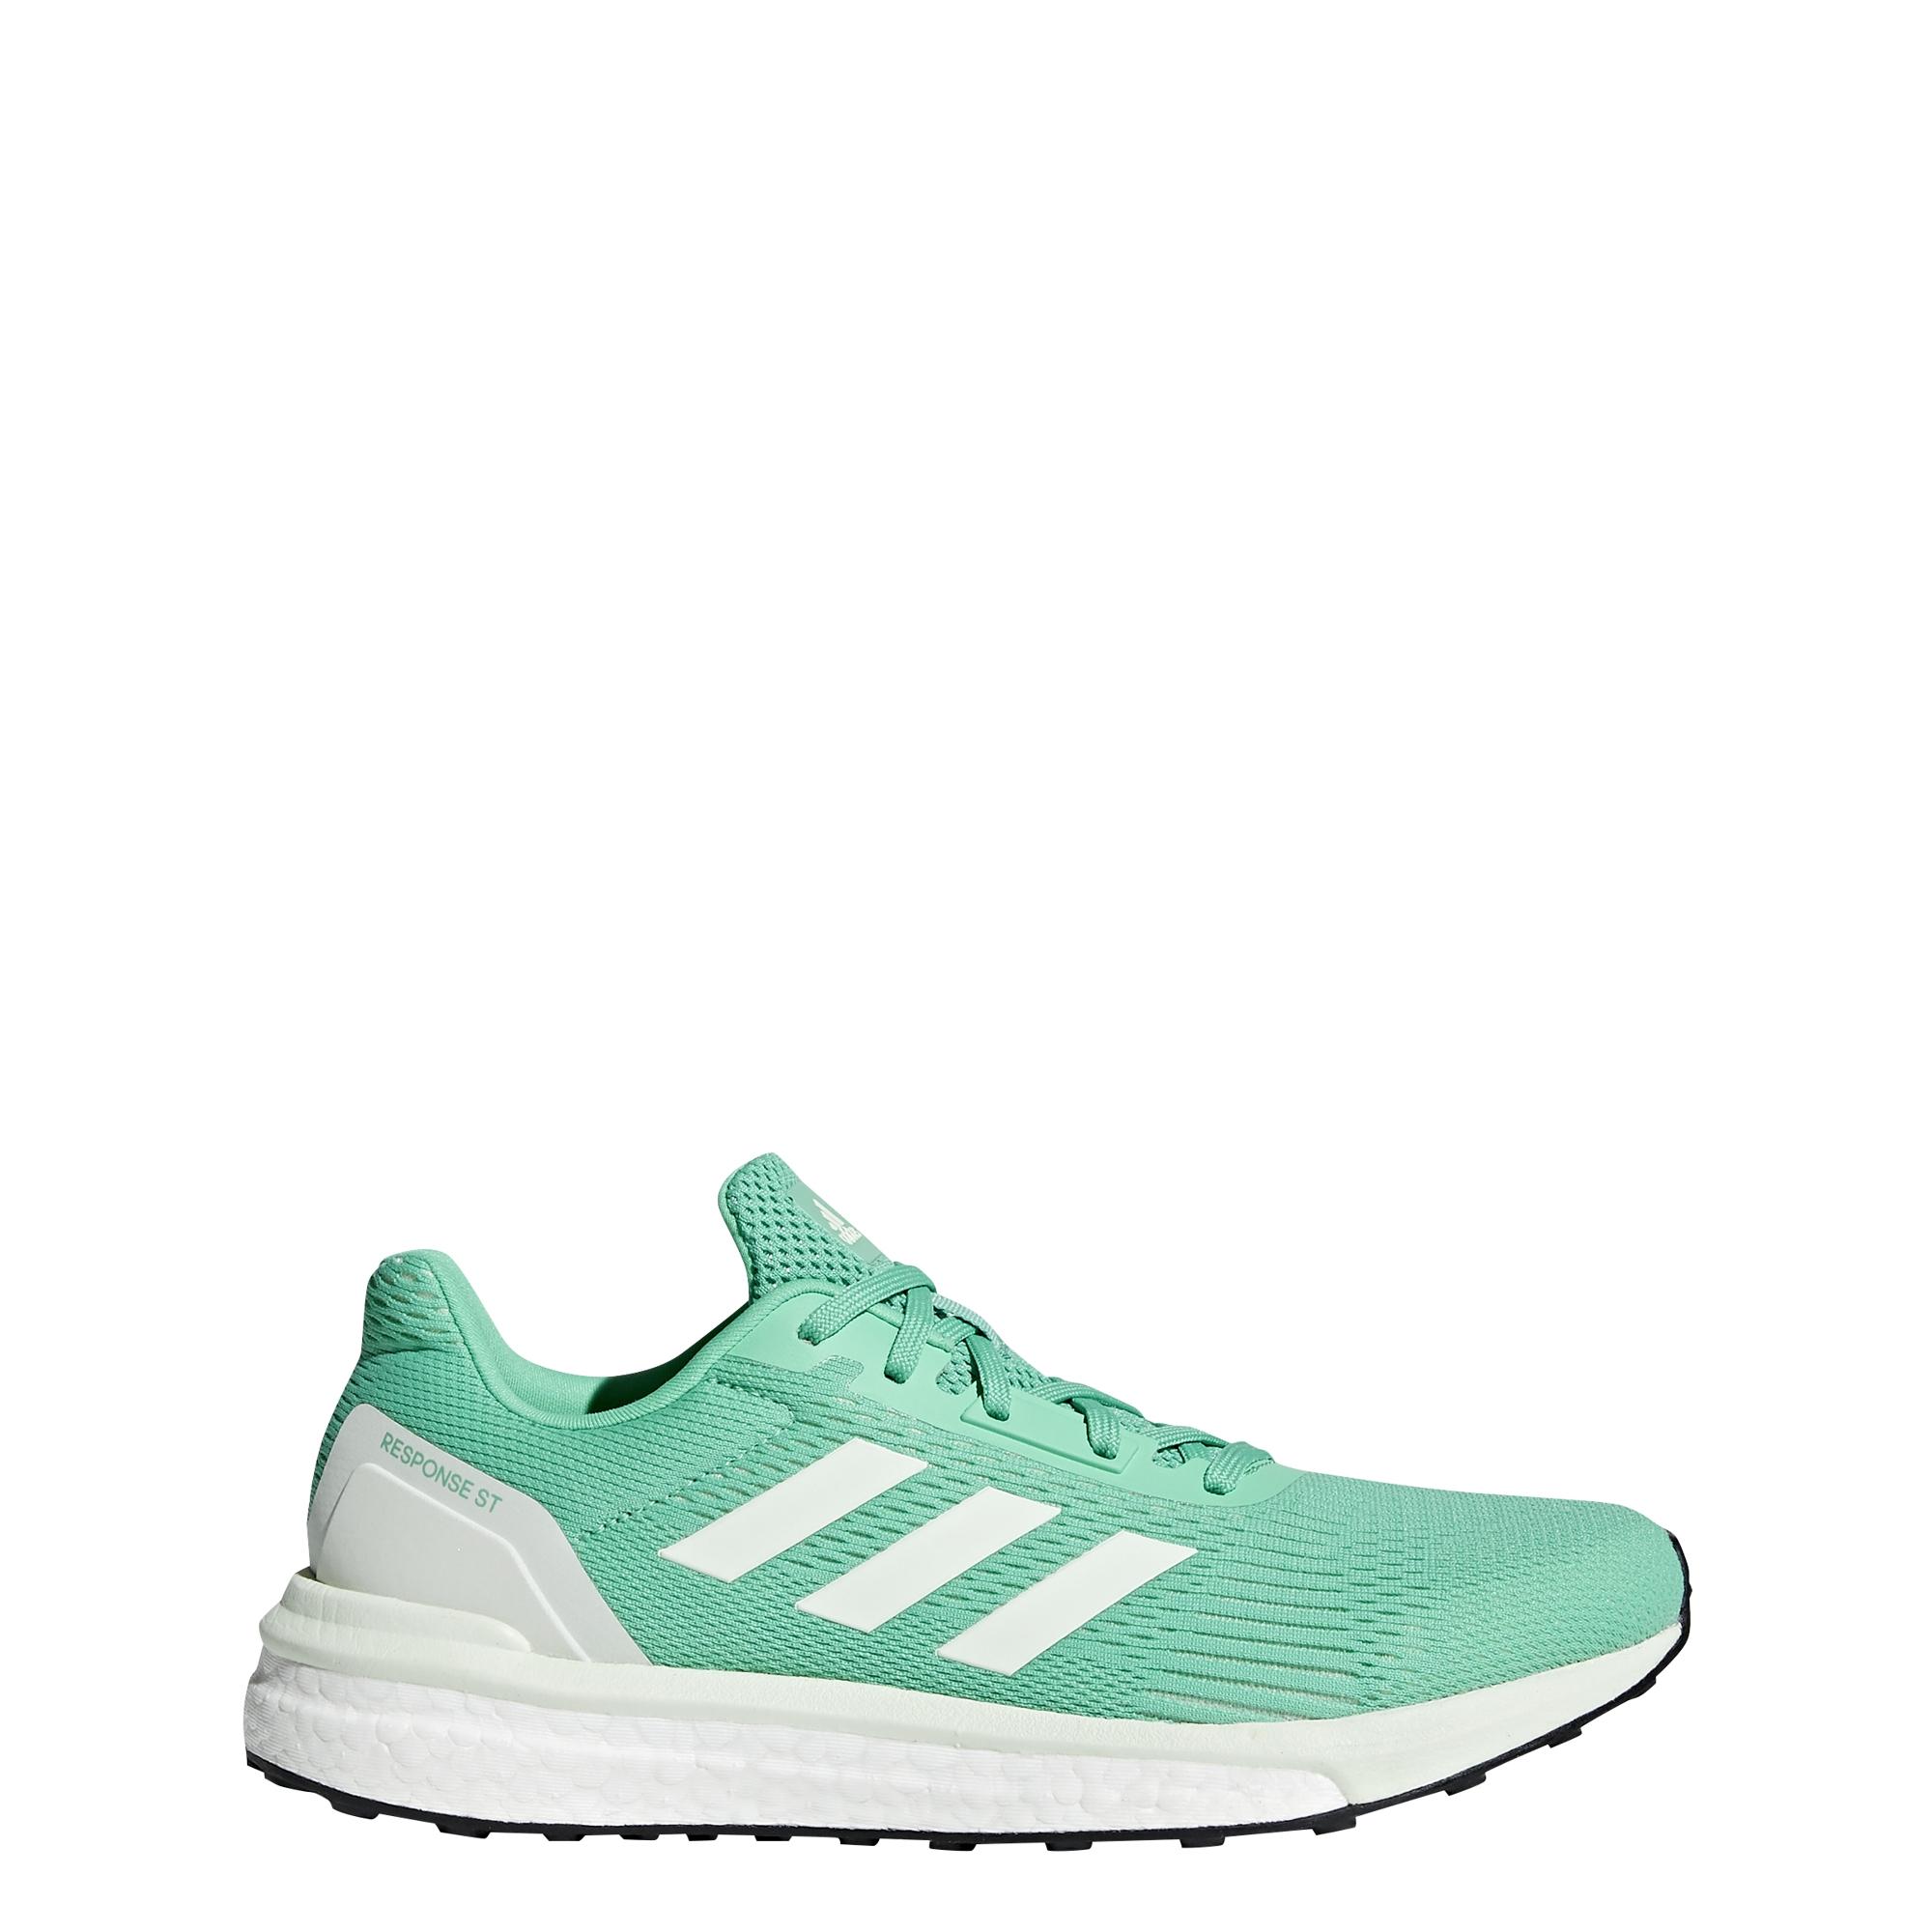 Chaussures femme adidas Response ST